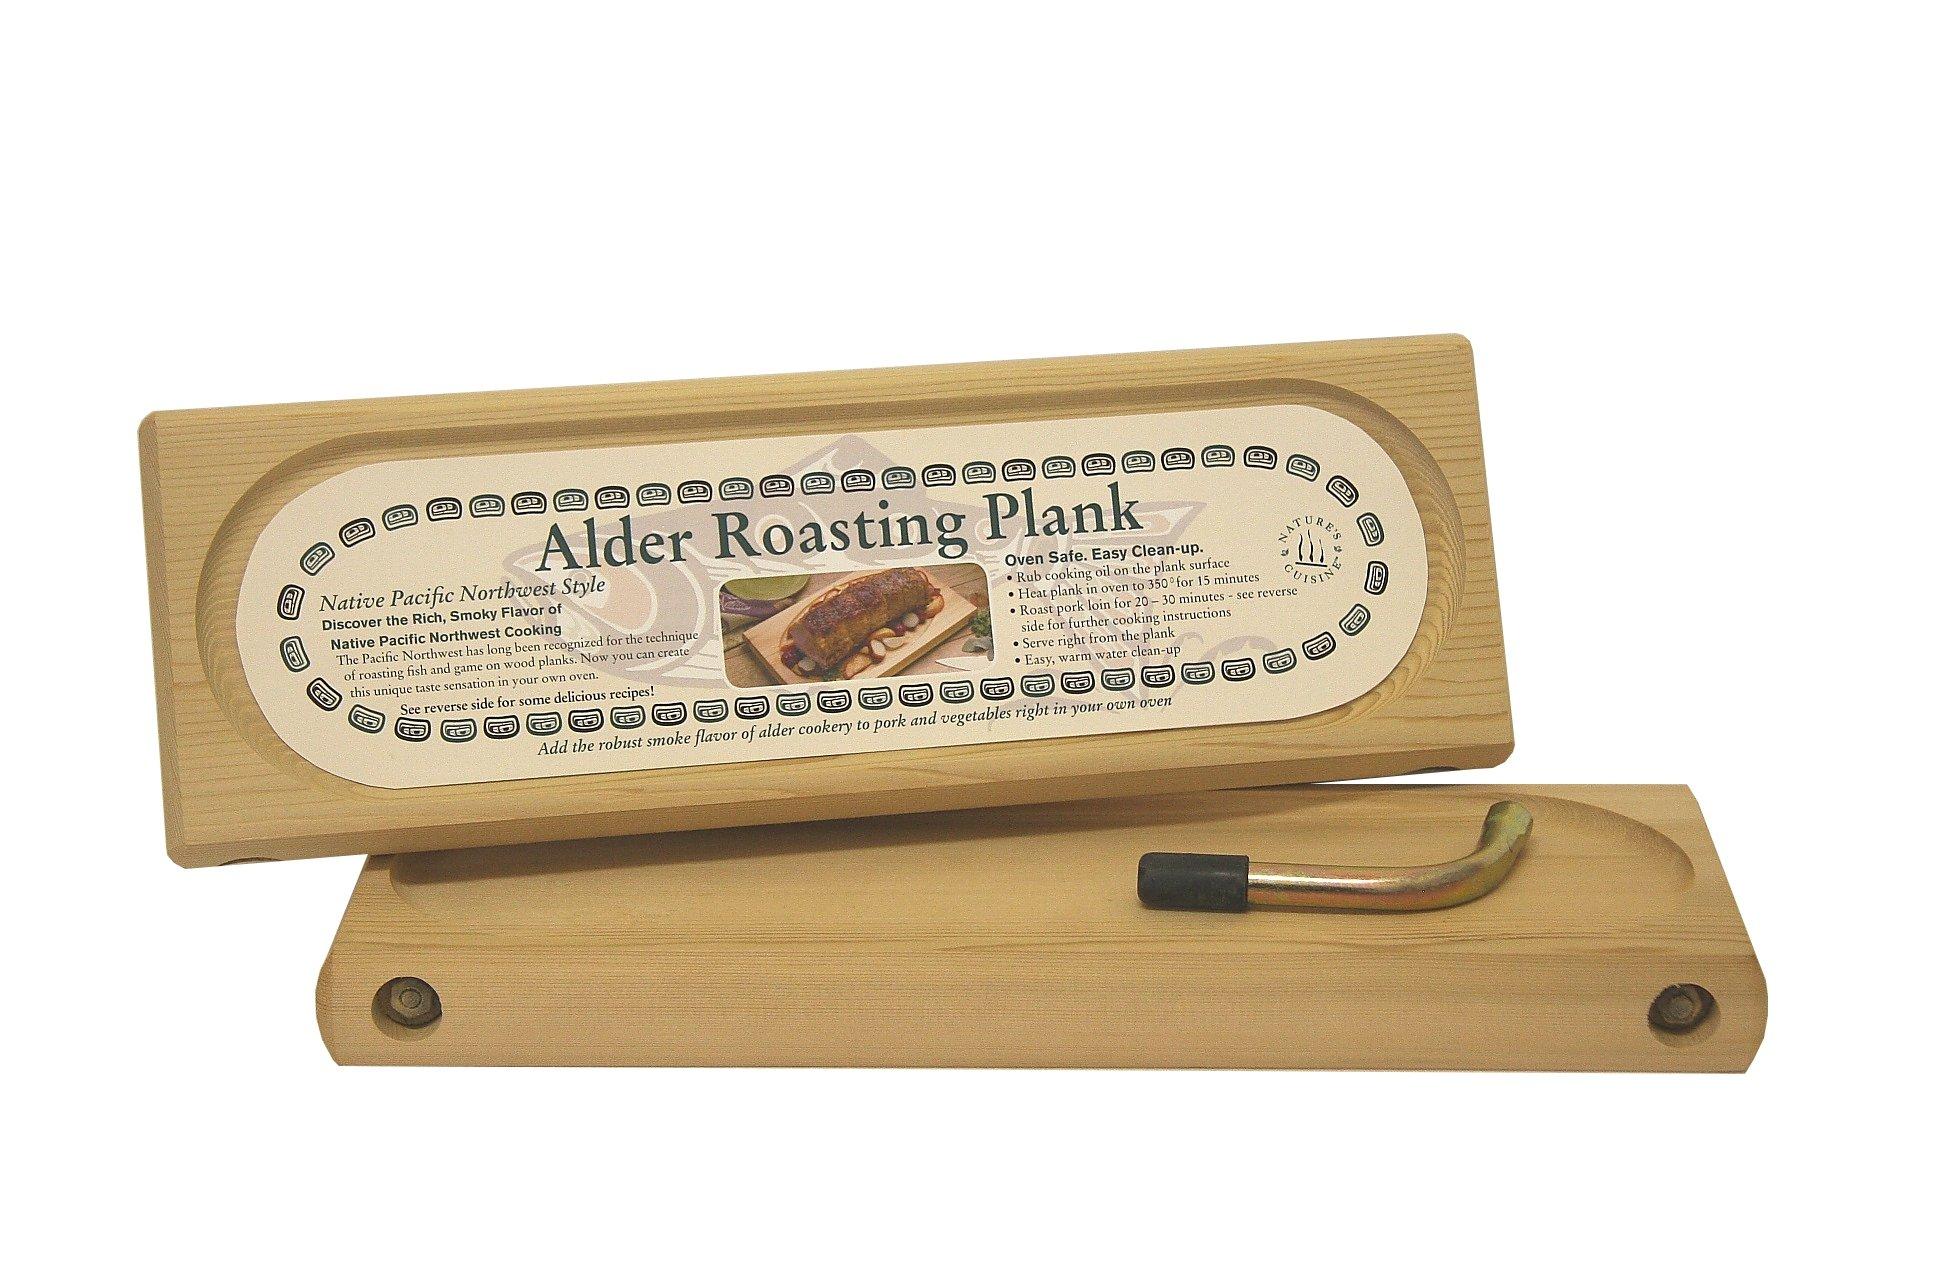 Natures Cuisine NC003-16 Alder Roasting Plank, 16-Inch